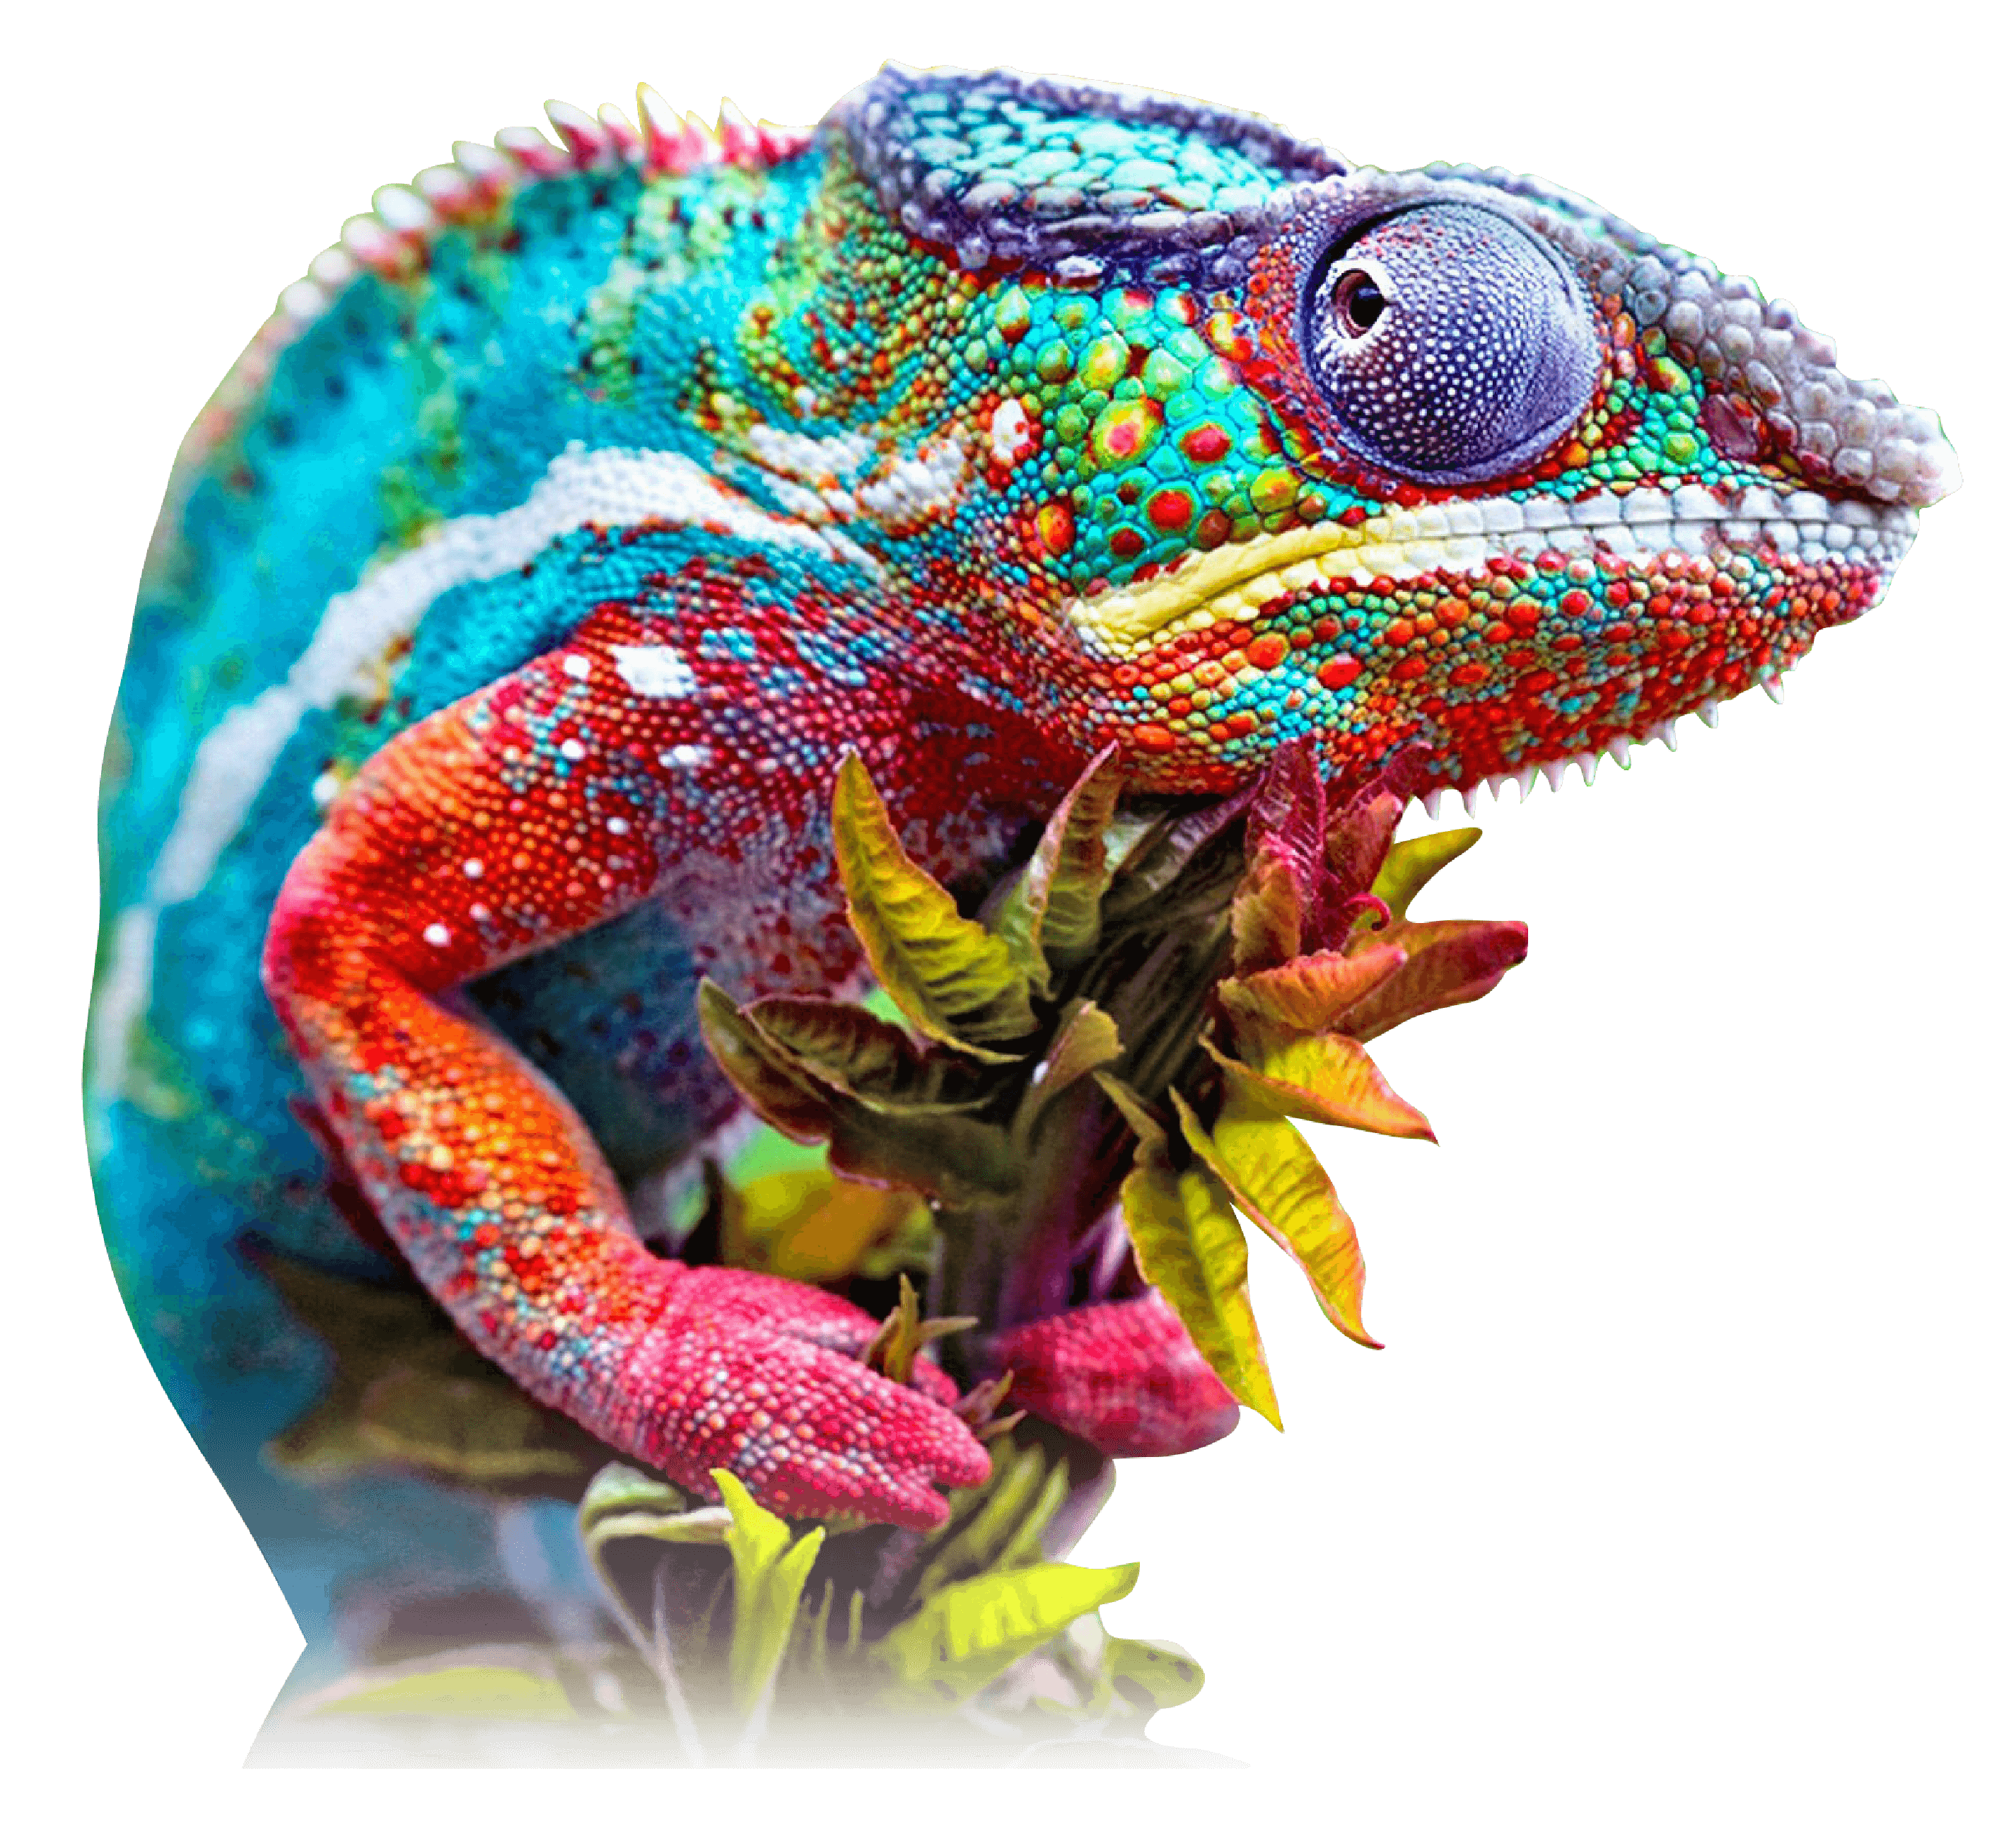 kamaleon colores (1)